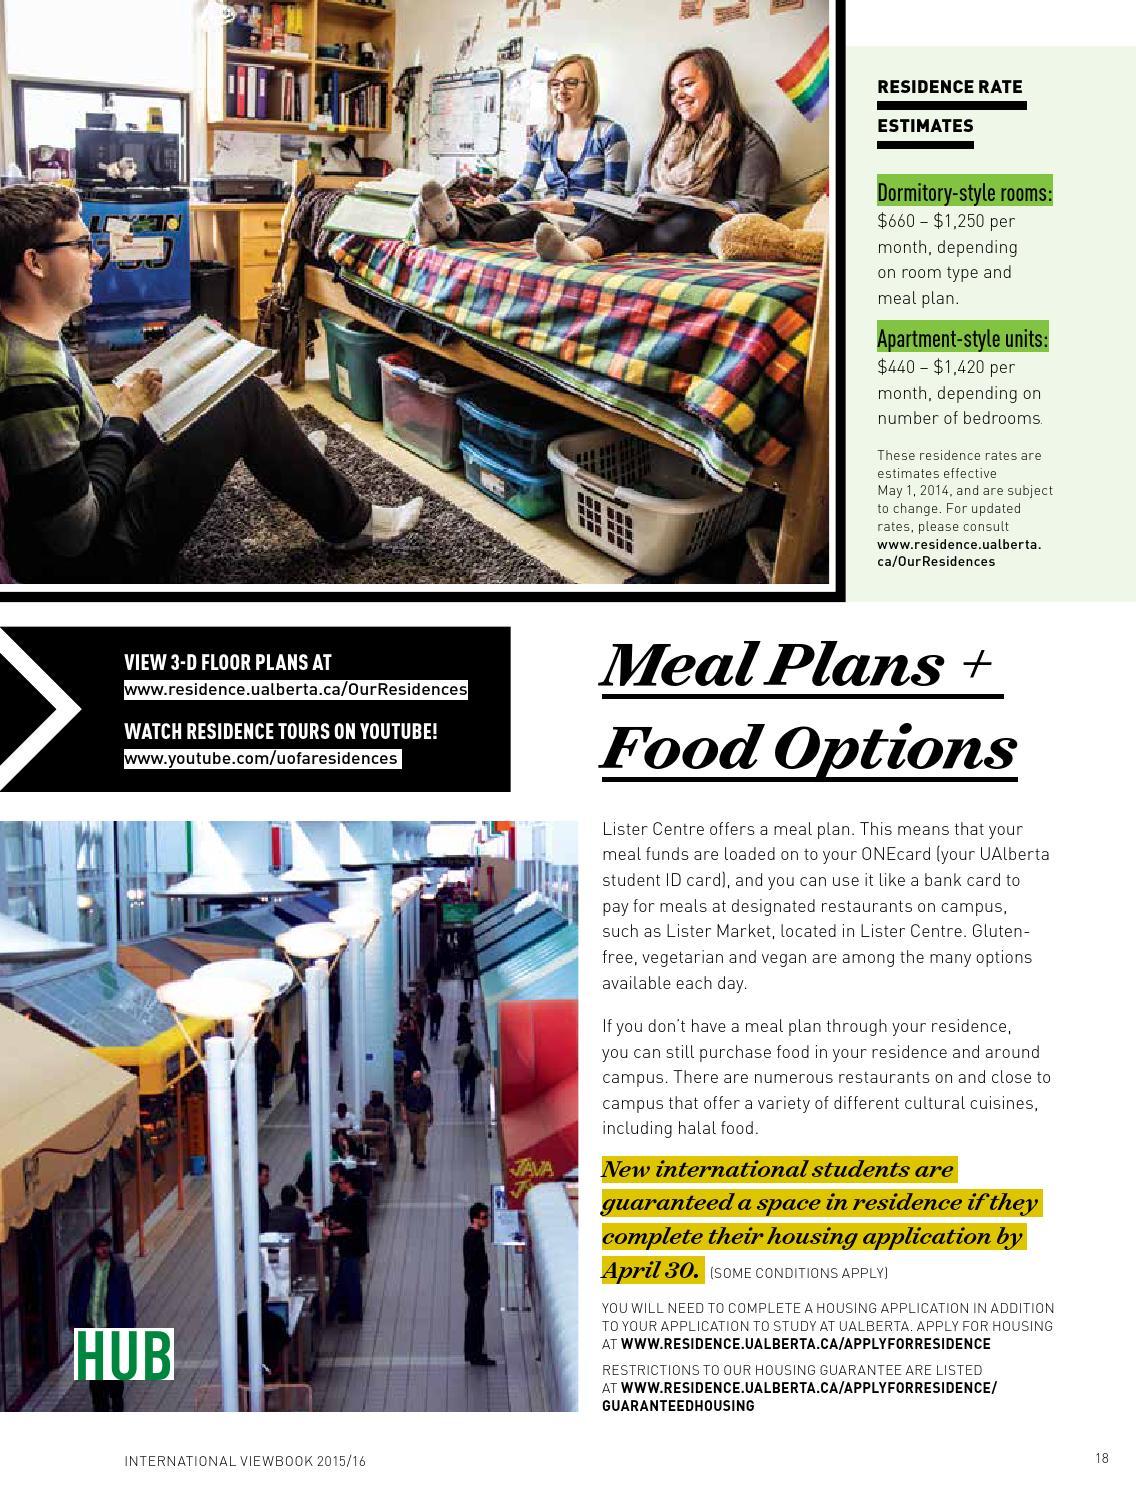 University student diet plan